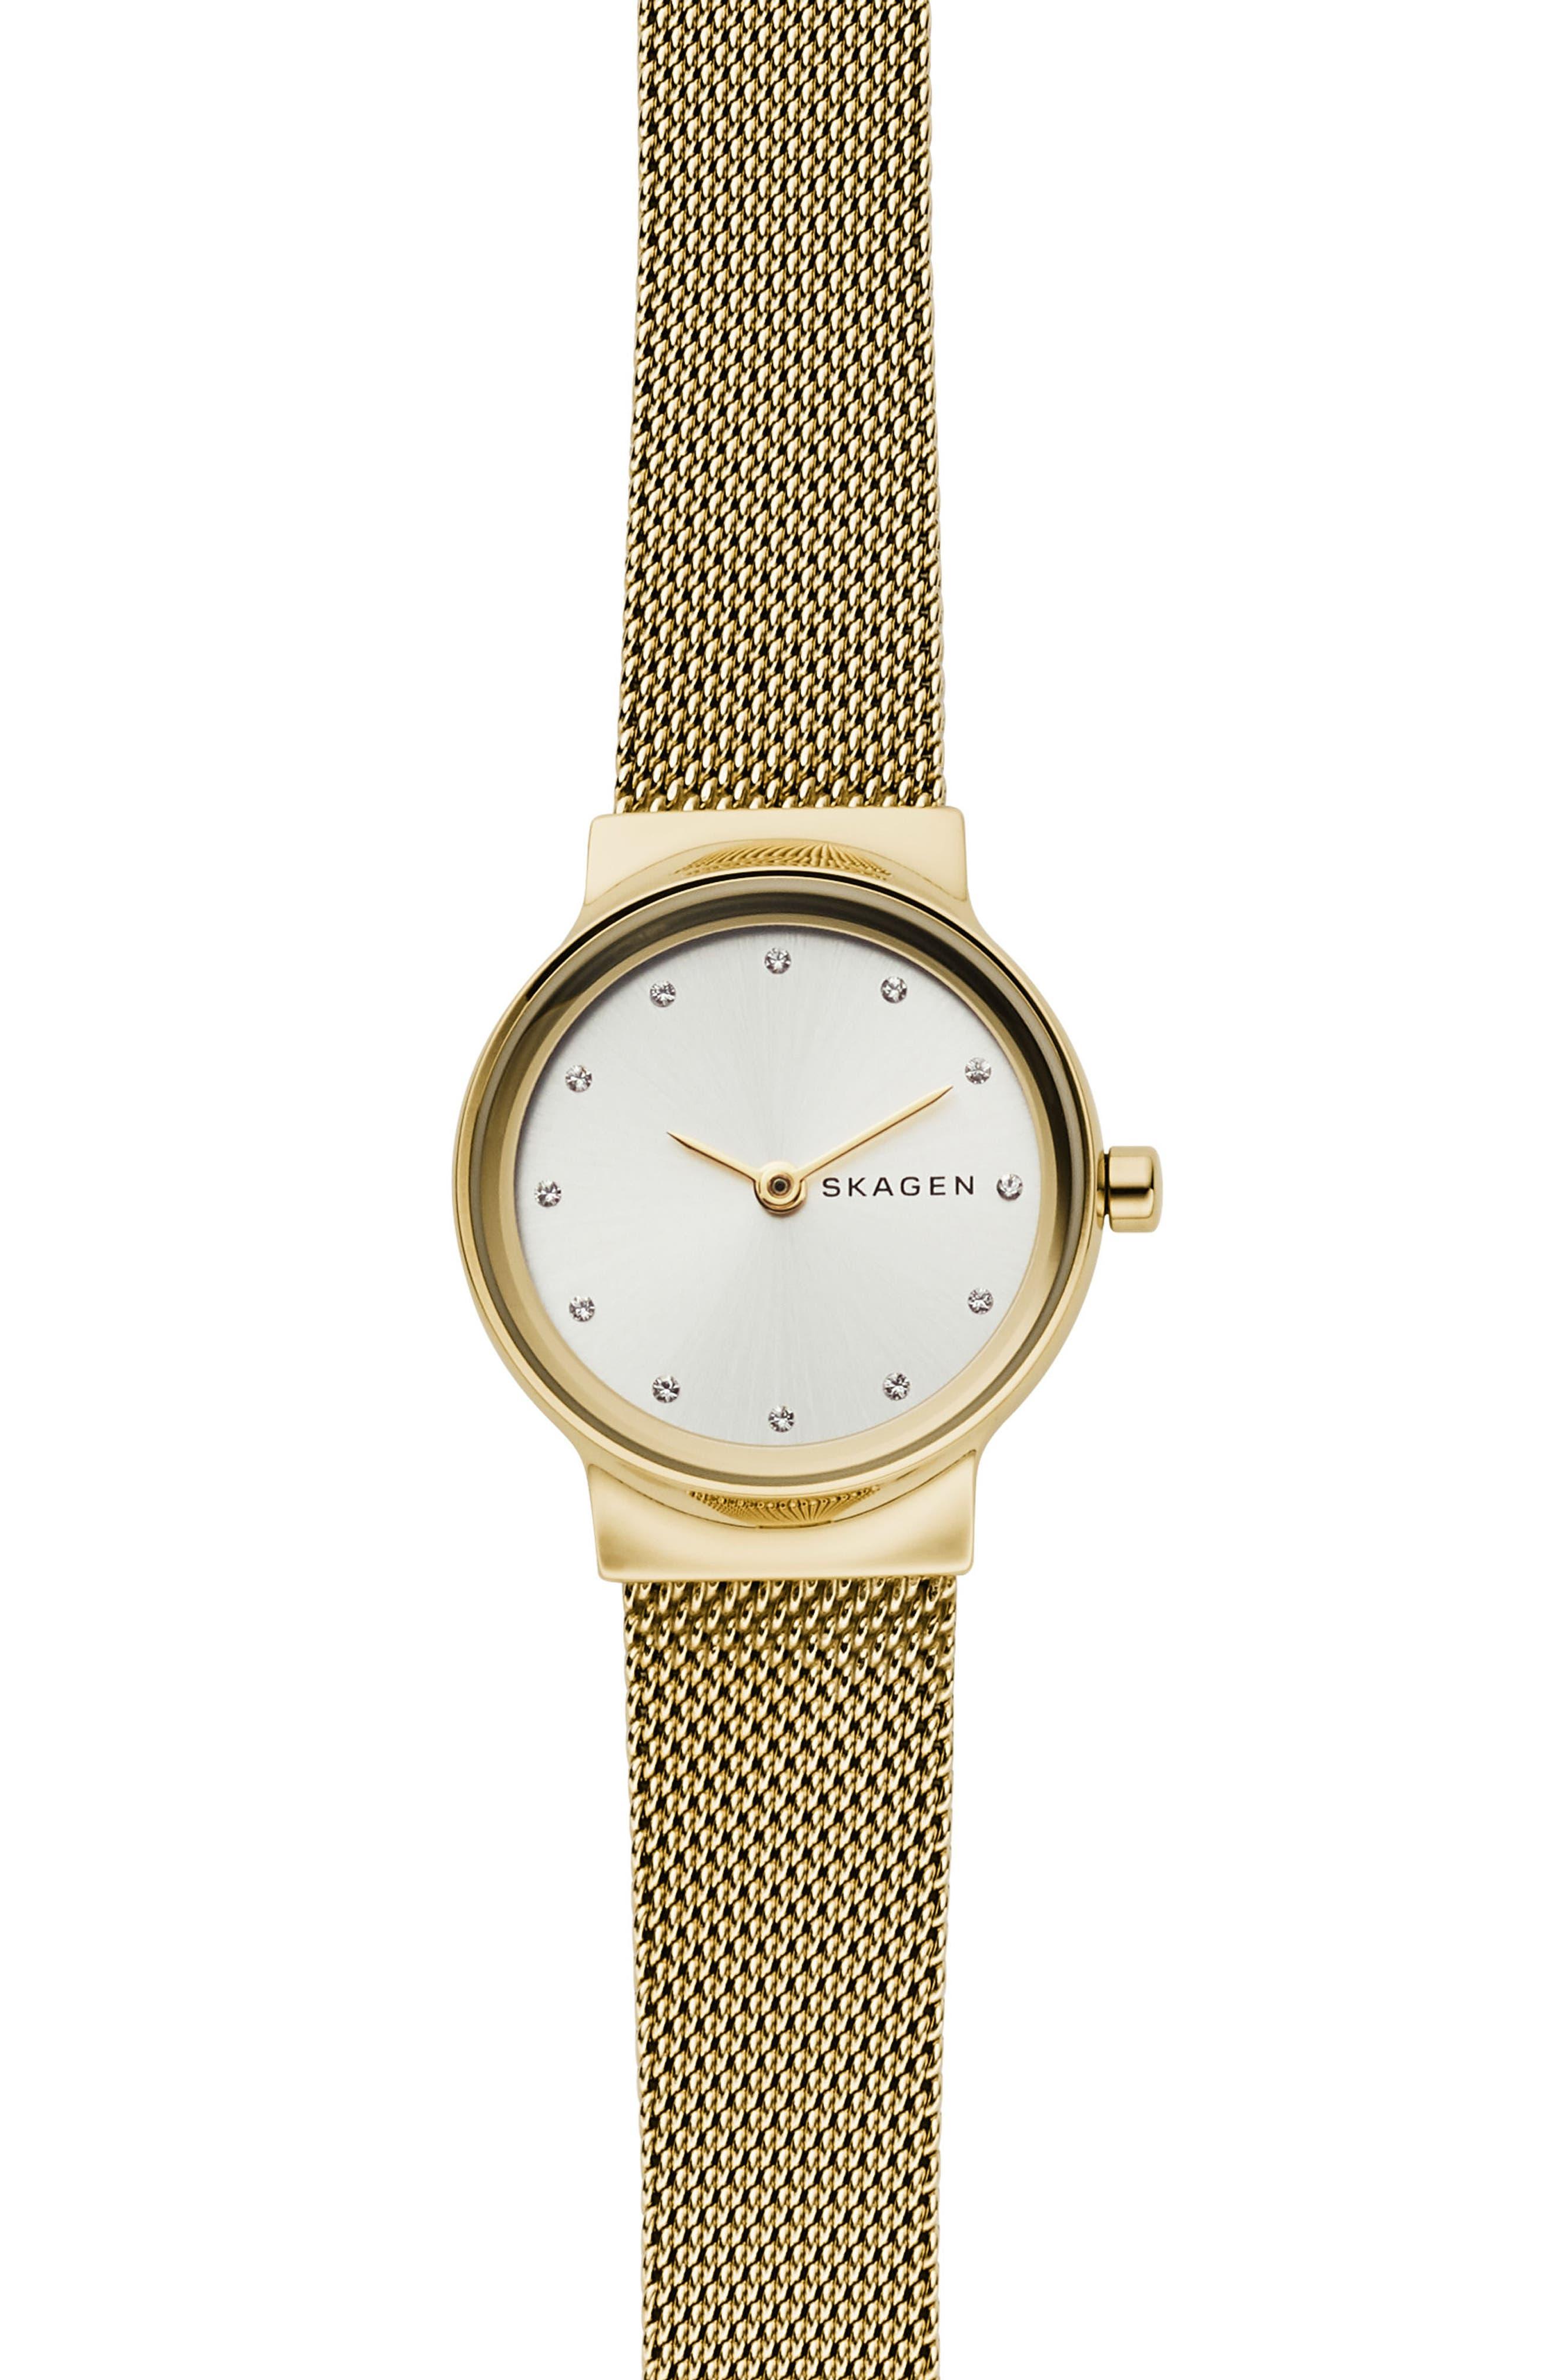 SKAGEN Freja Bracelet Watch, 26mm, Main, color, GOLD/ SILVER/ GOLD